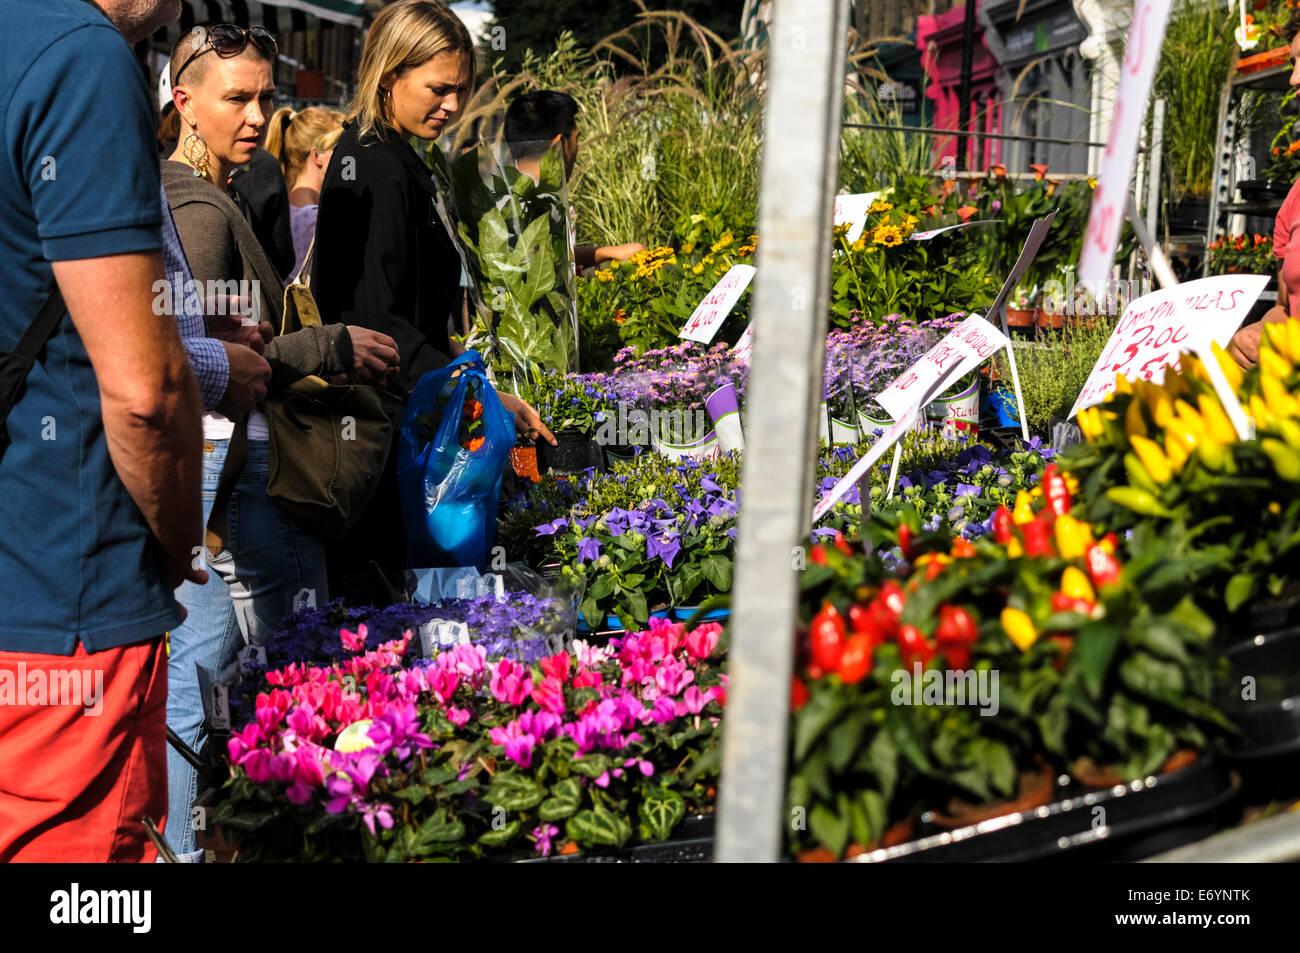 Colombia road Flower market, London, UK - Stock Image